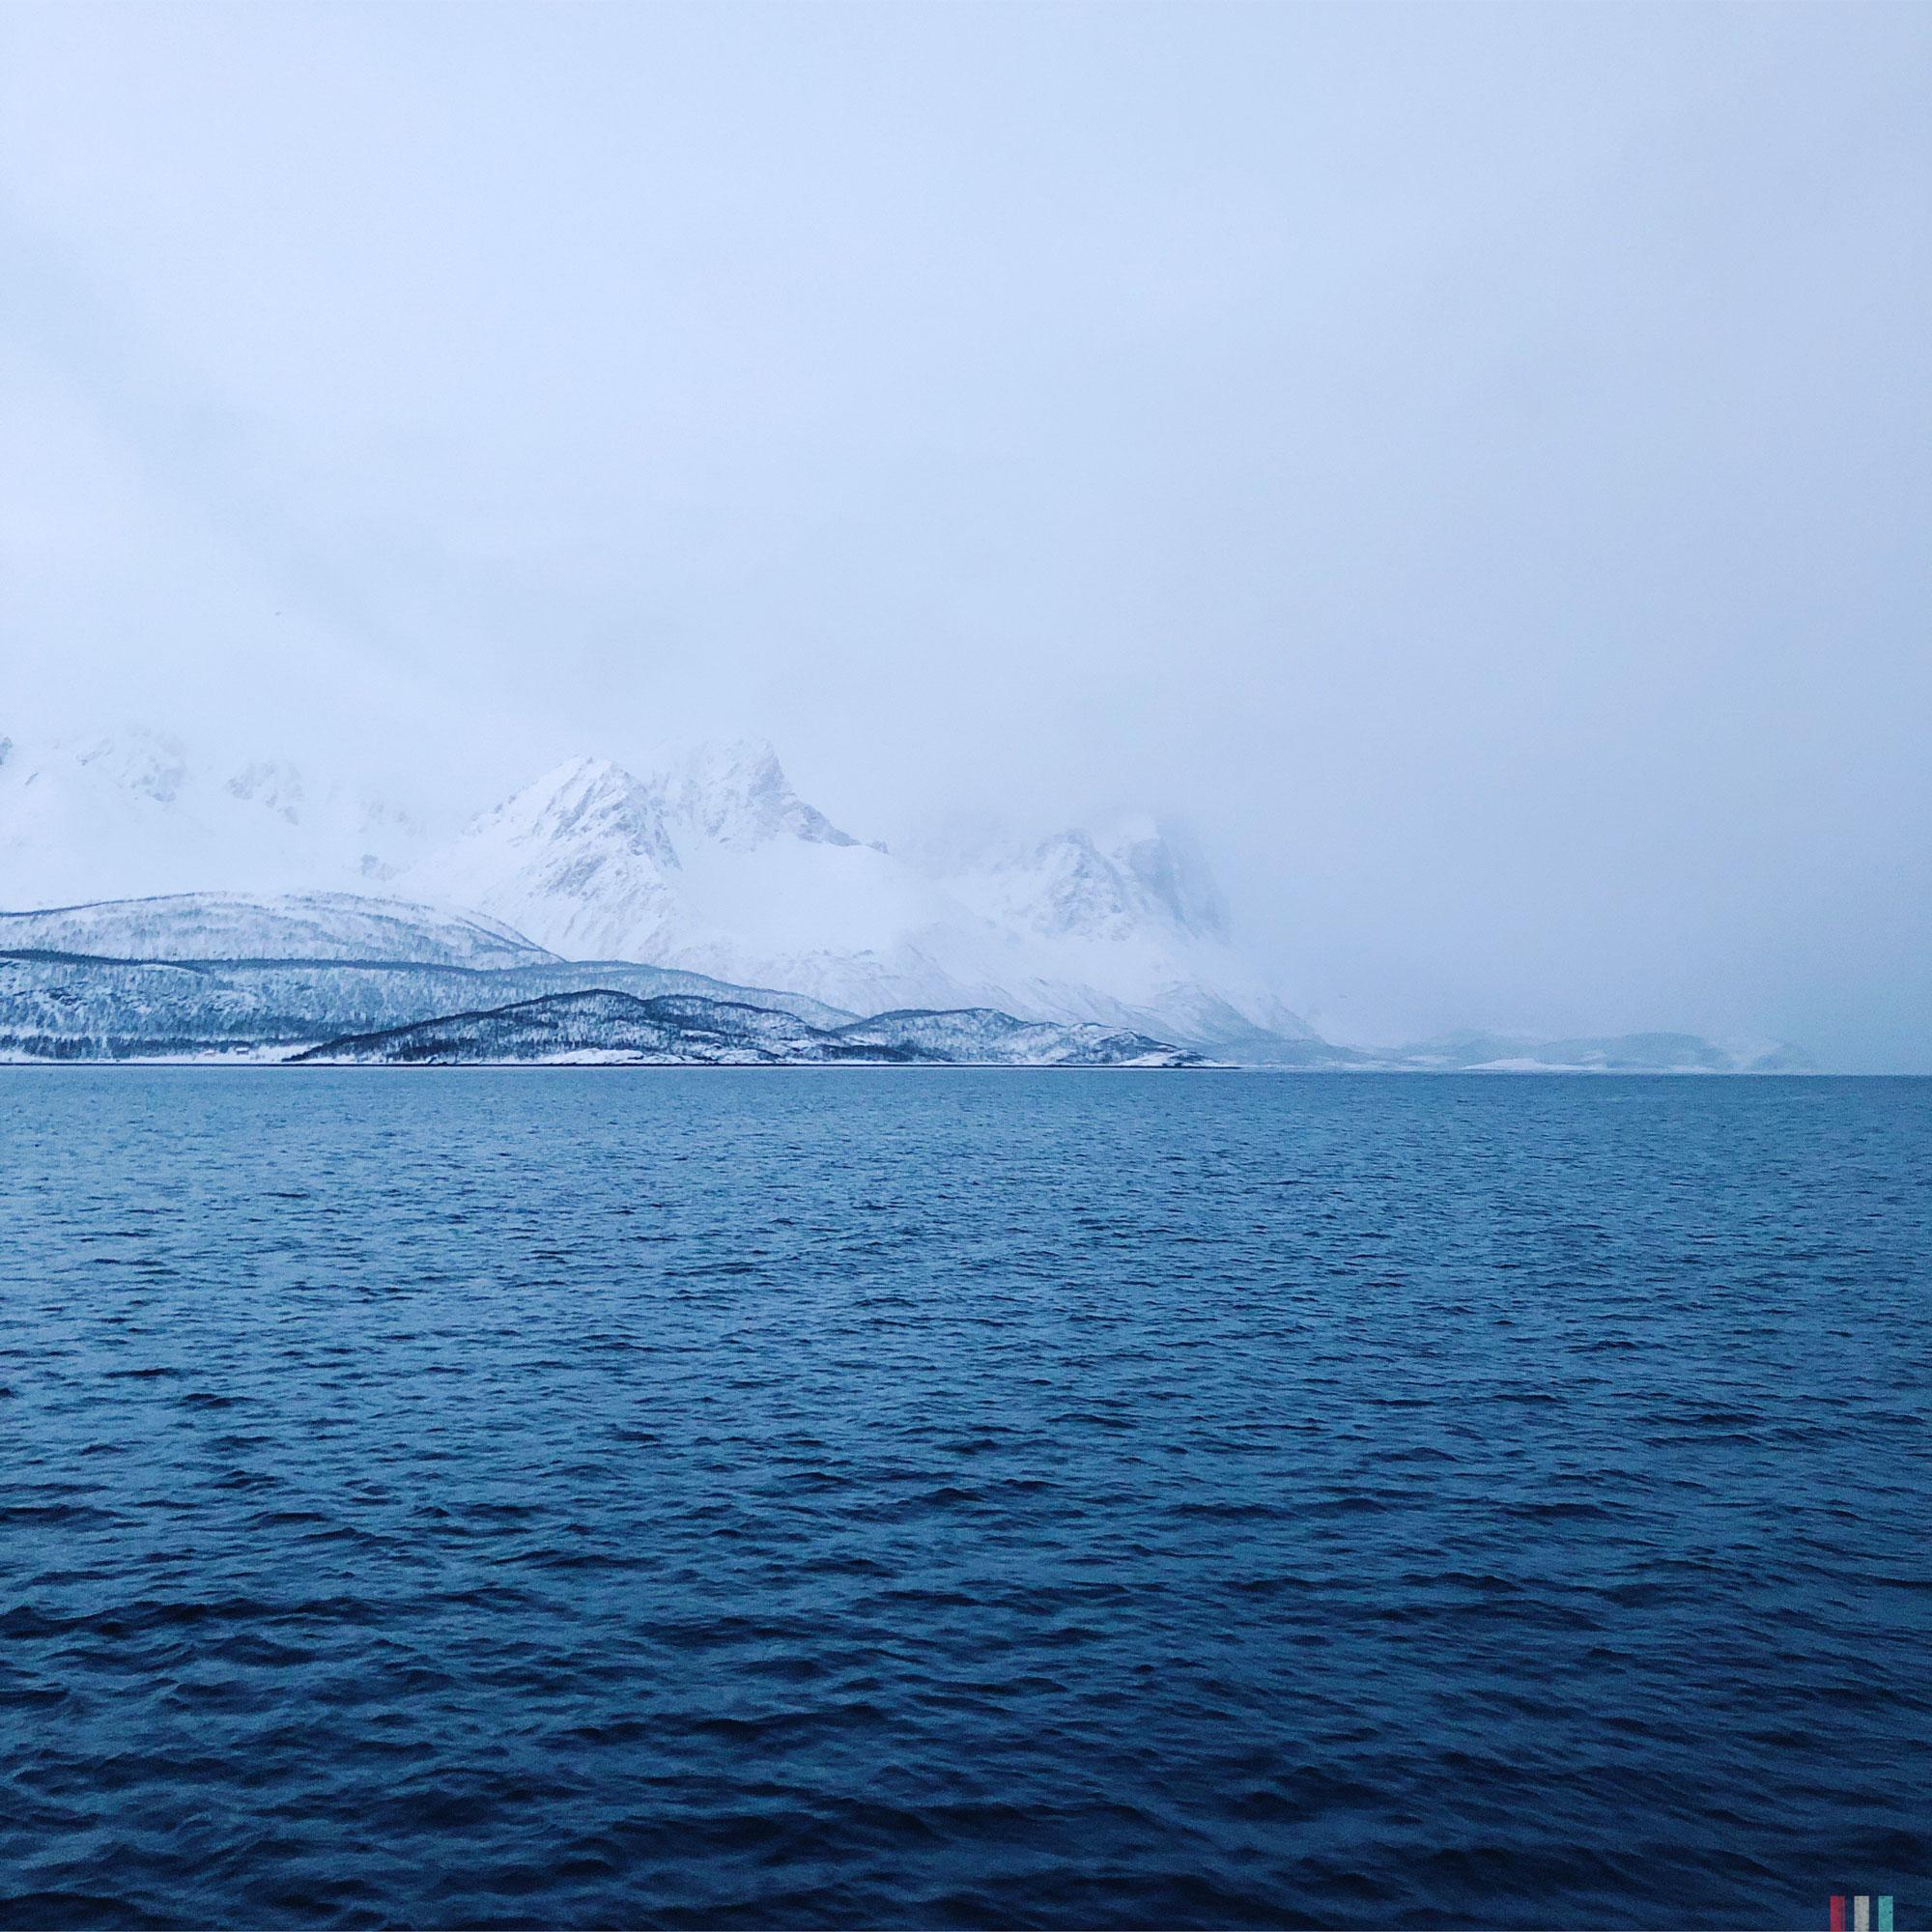 norwegen-tromso-segeltour-kvaunangen-im-nebel.JPG